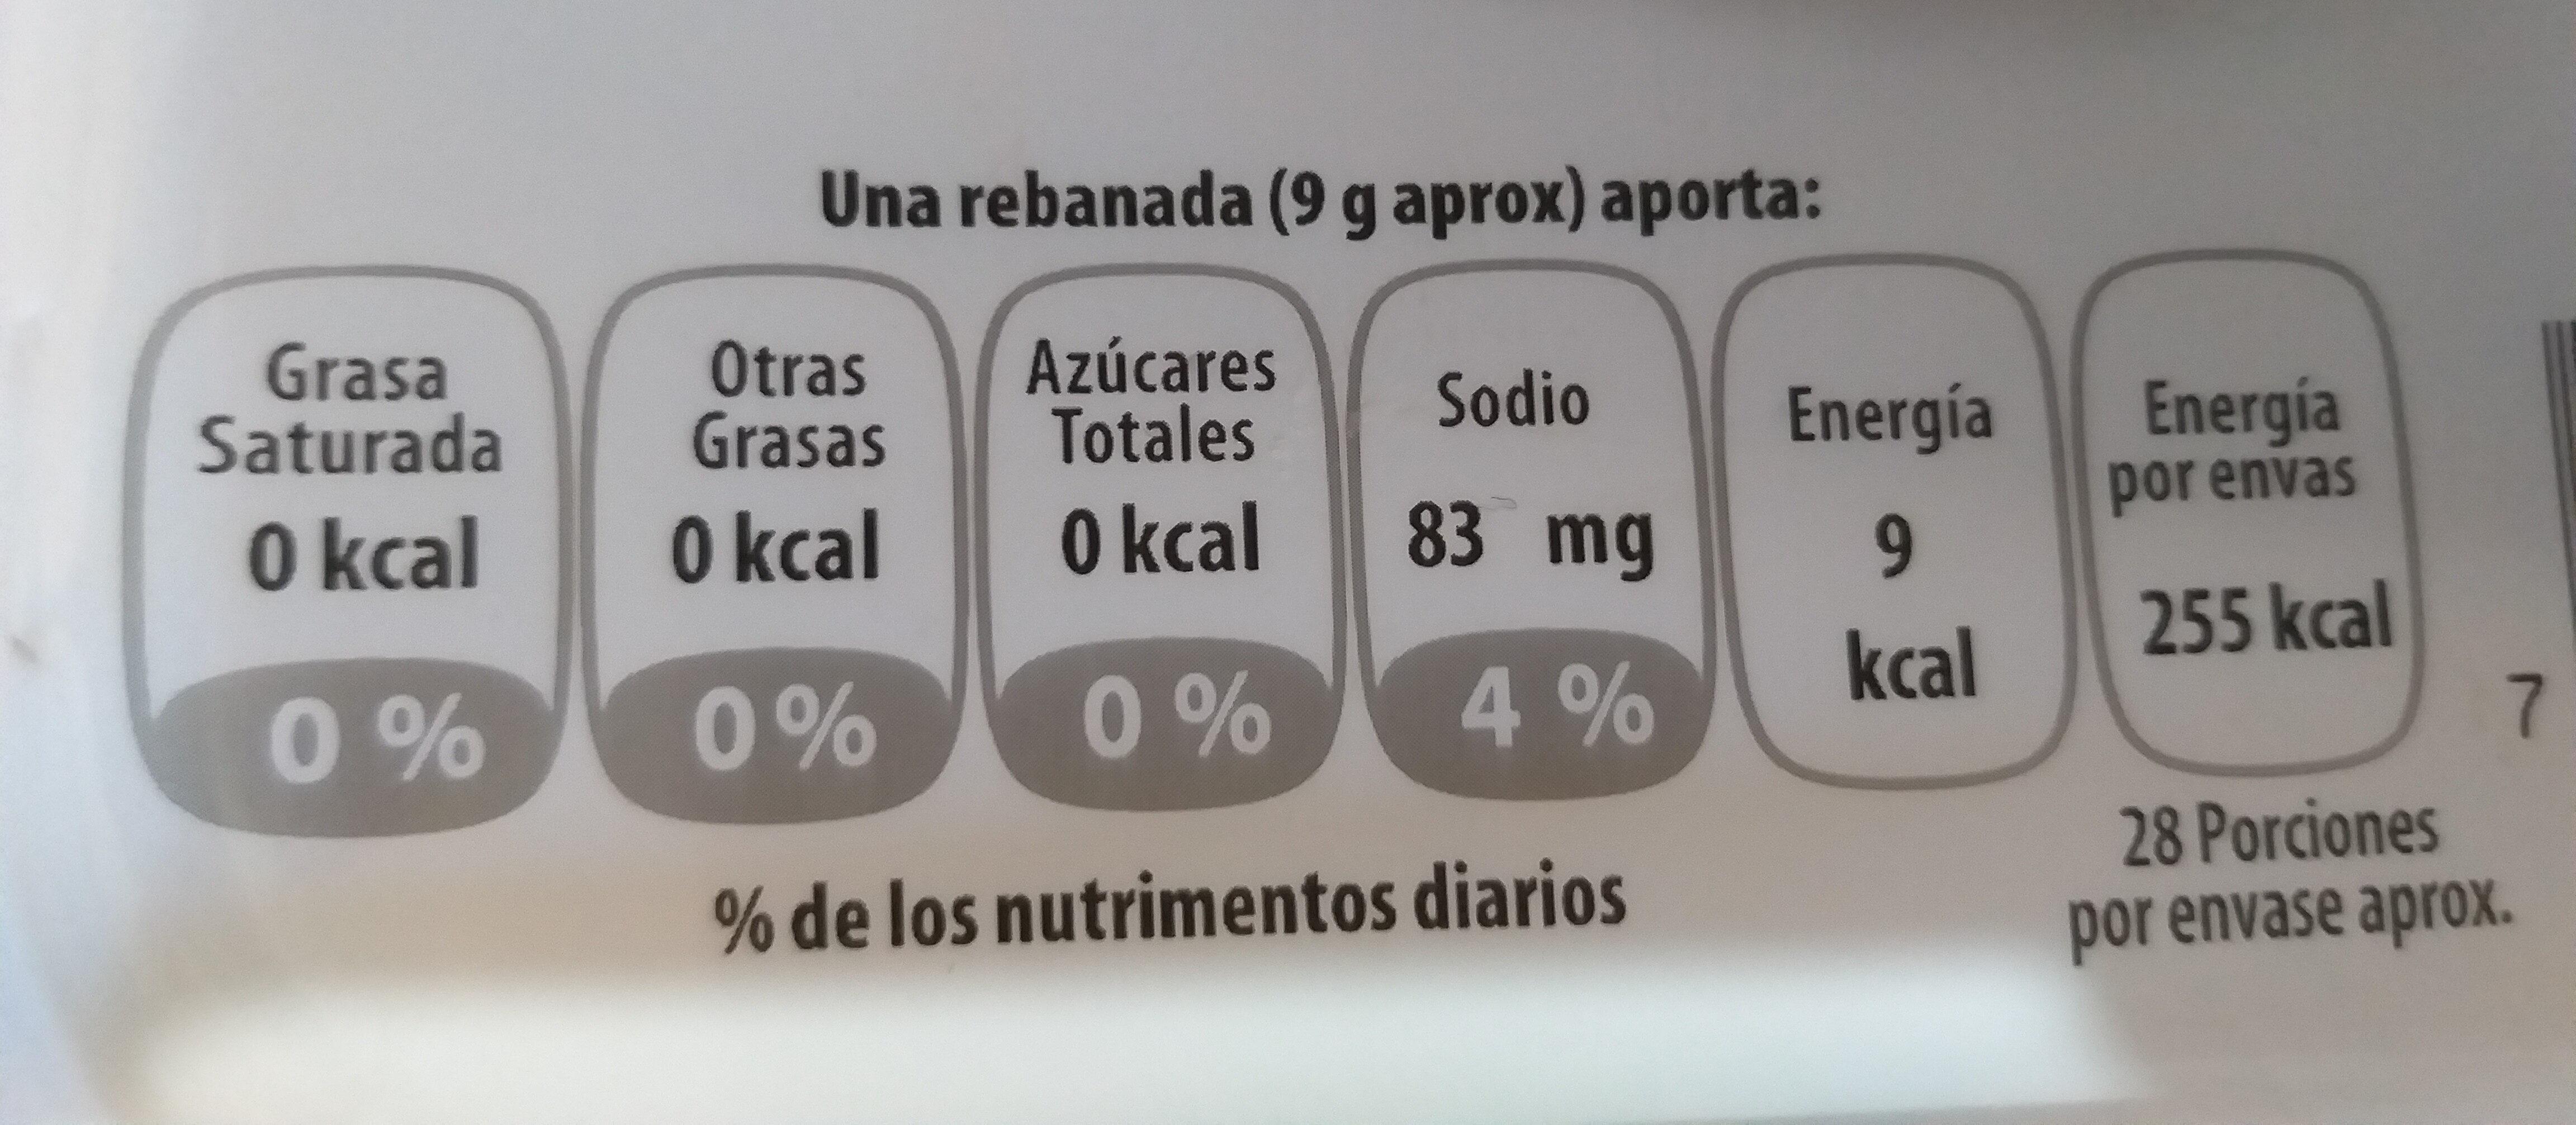 pechuga de pavo extrafina - Nutrition facts